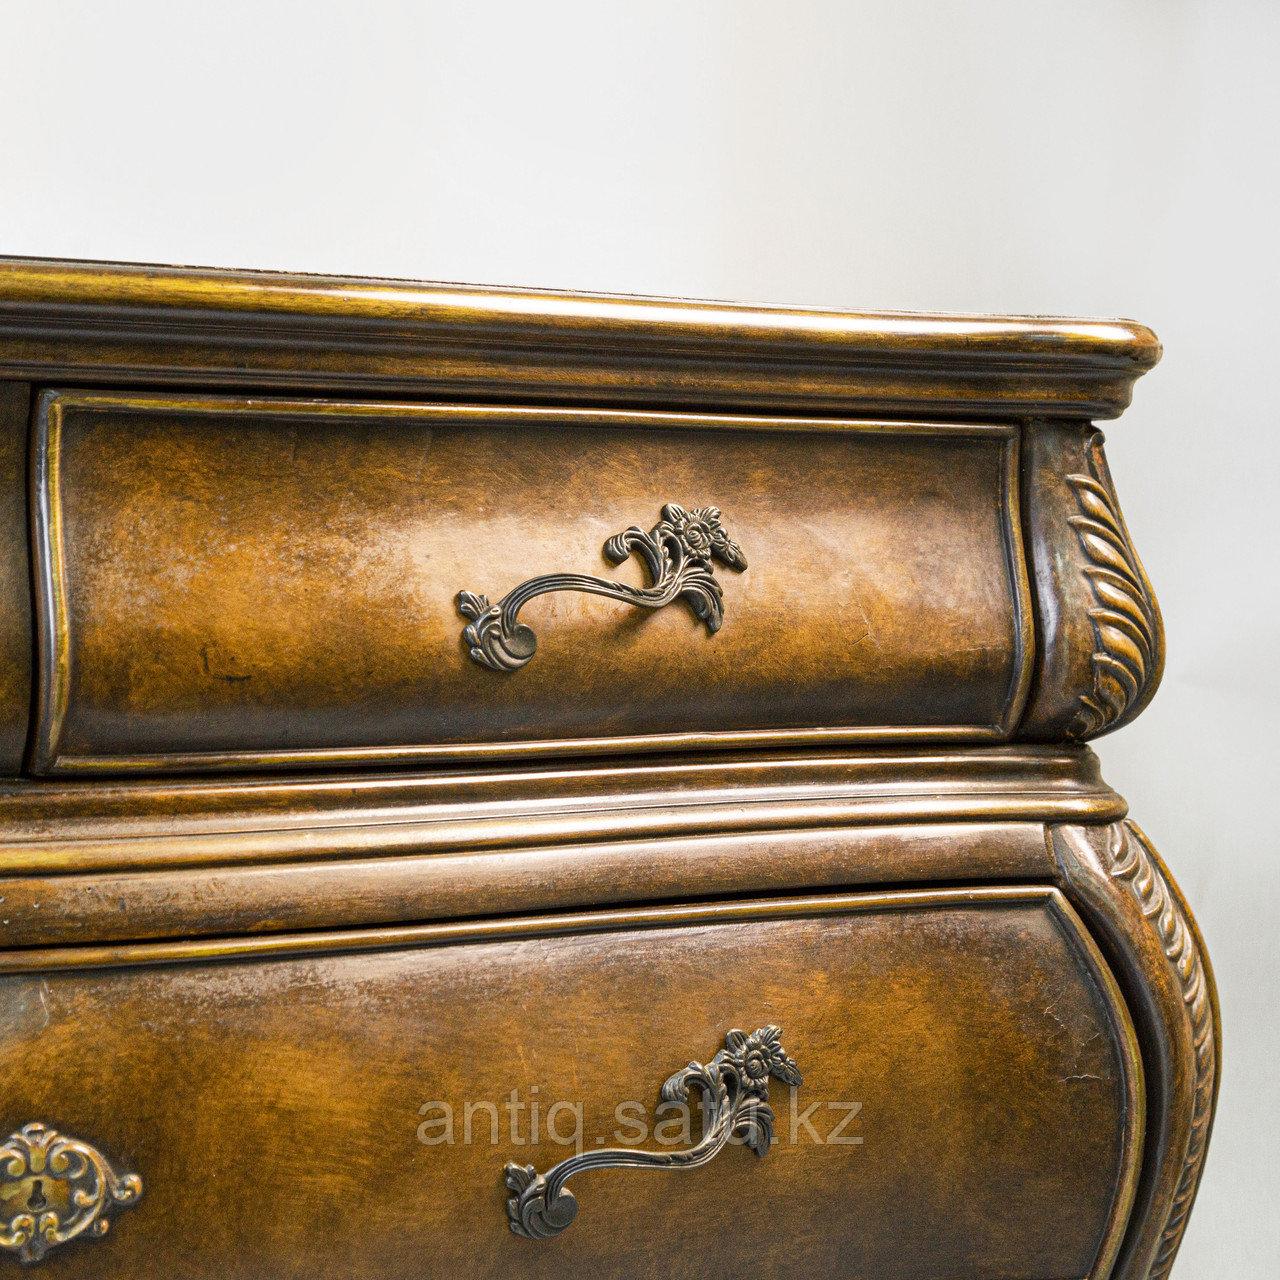 Комод в стиле Людовика XV Привезен из Голландии XX век. - фото 10